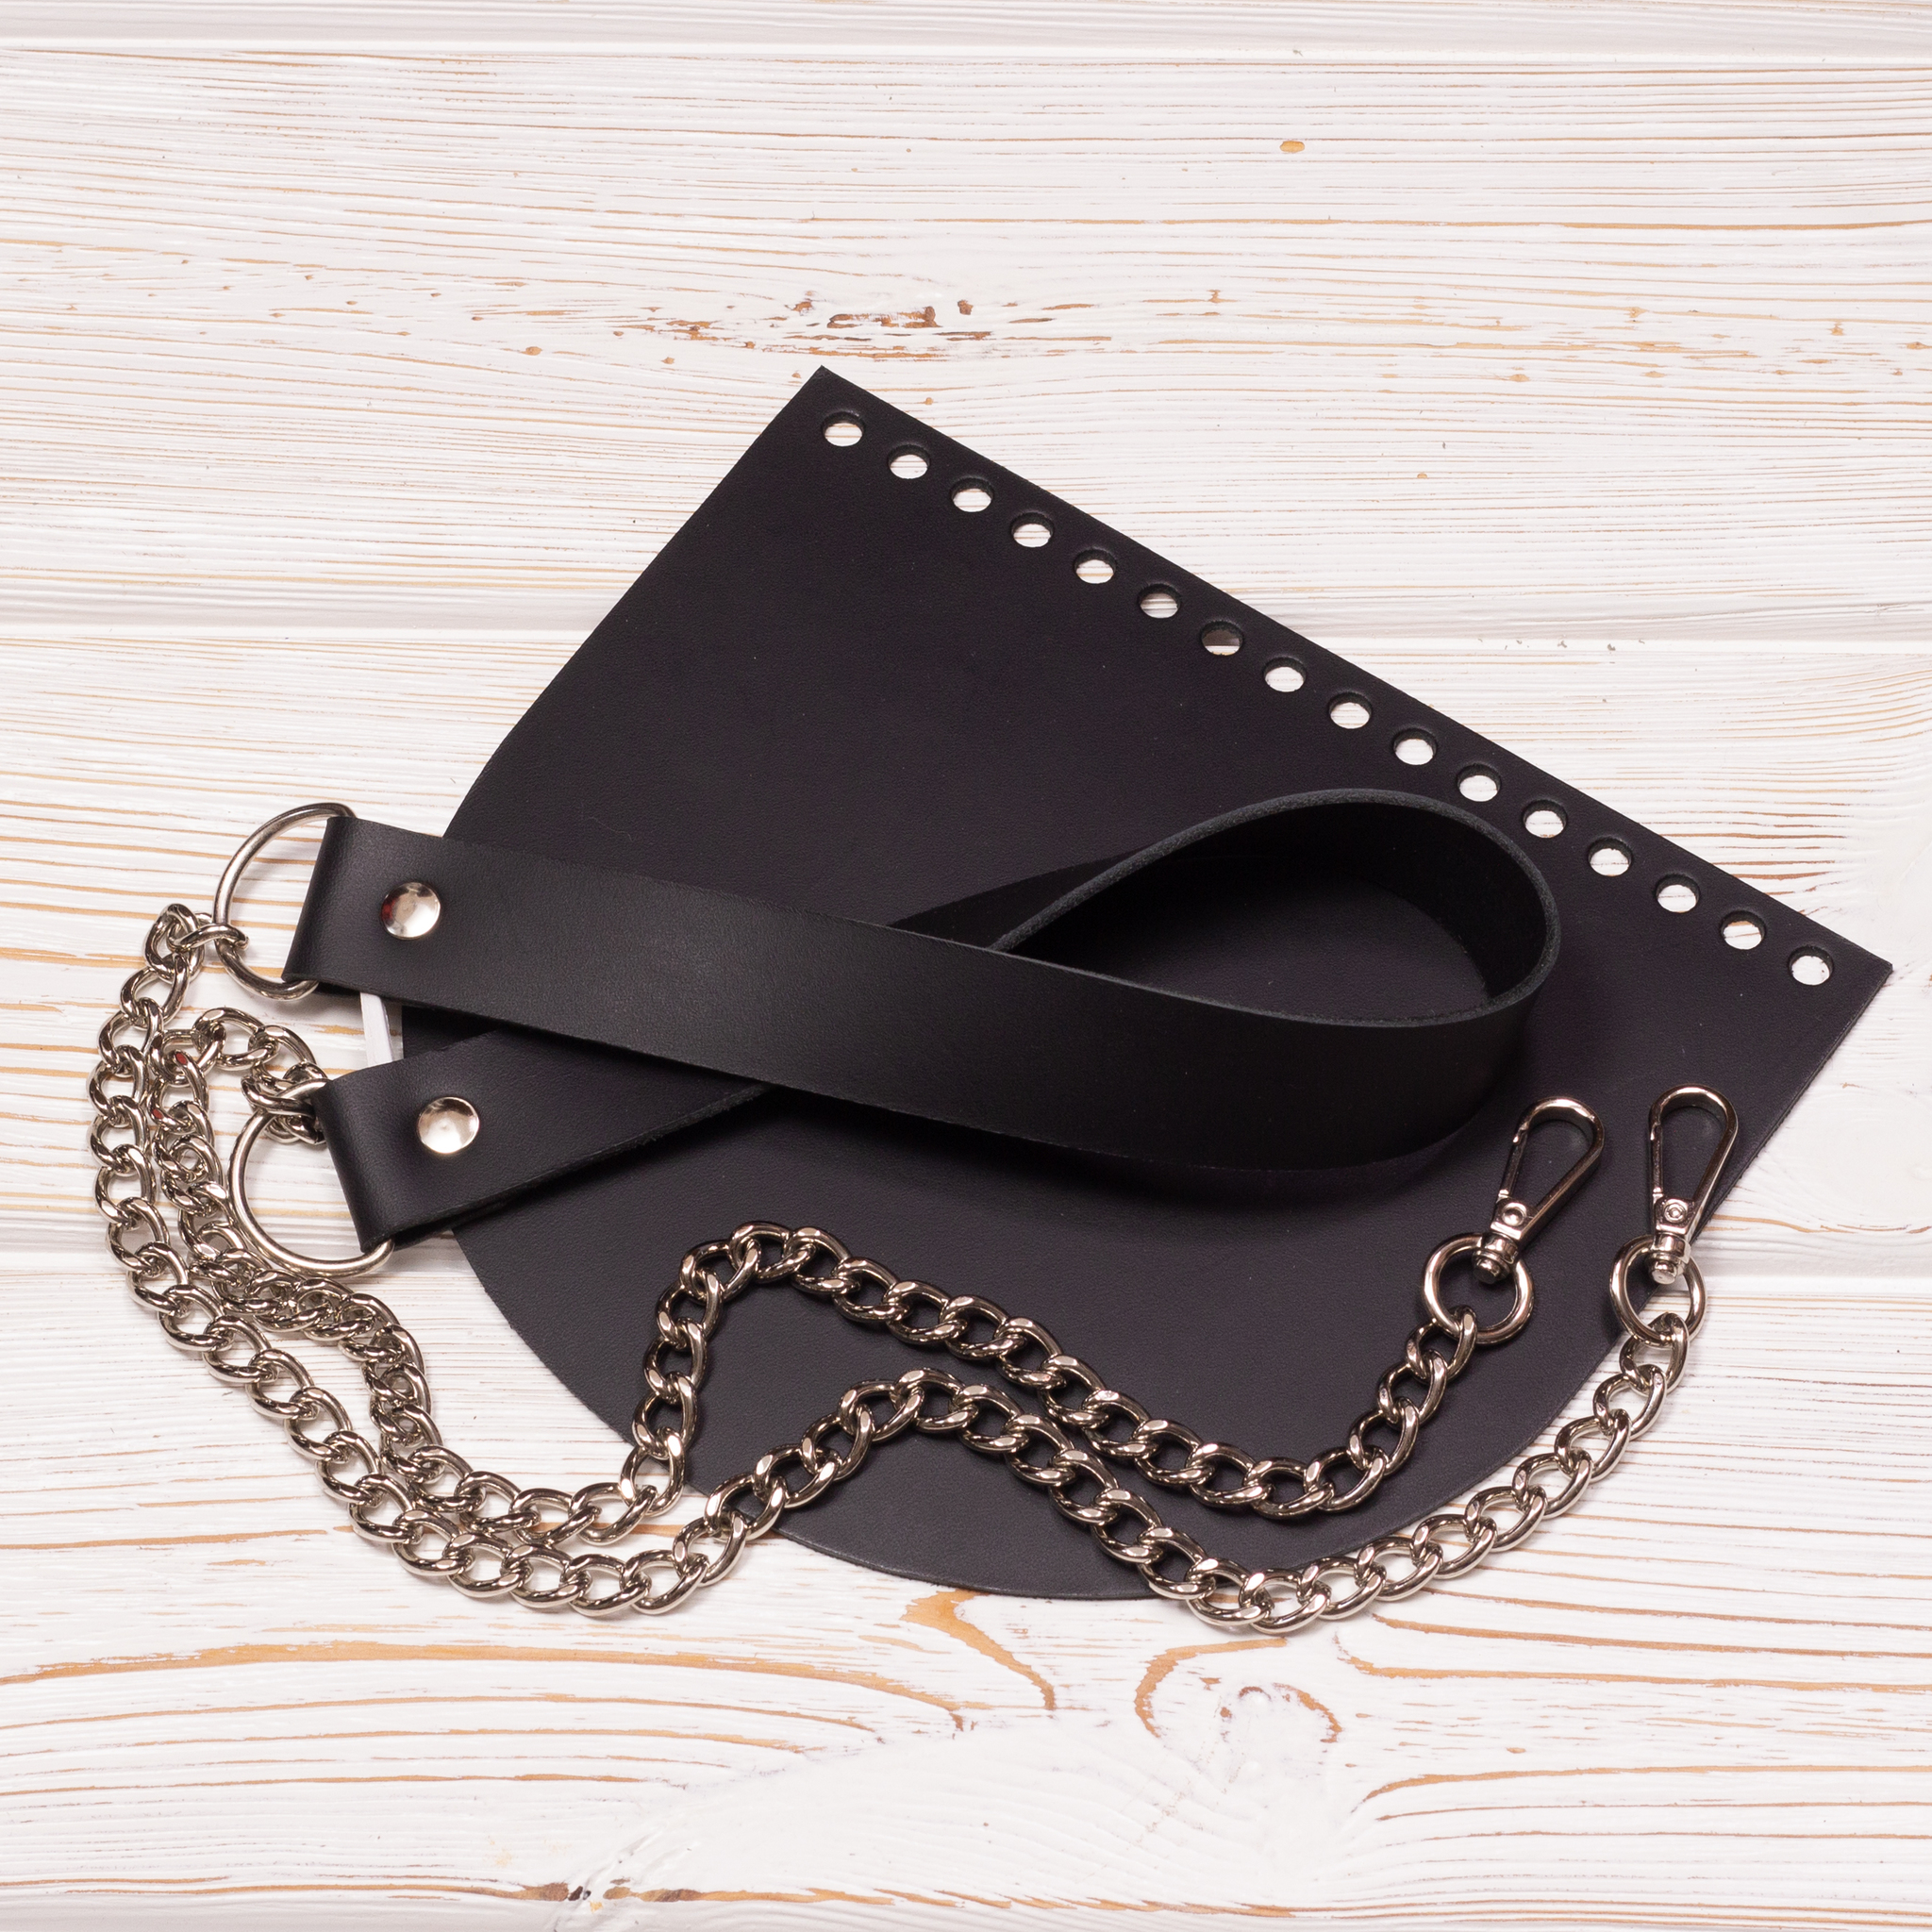 "Каталог Комплект для сумки ""Уголь"" IMG_2371.jpg"